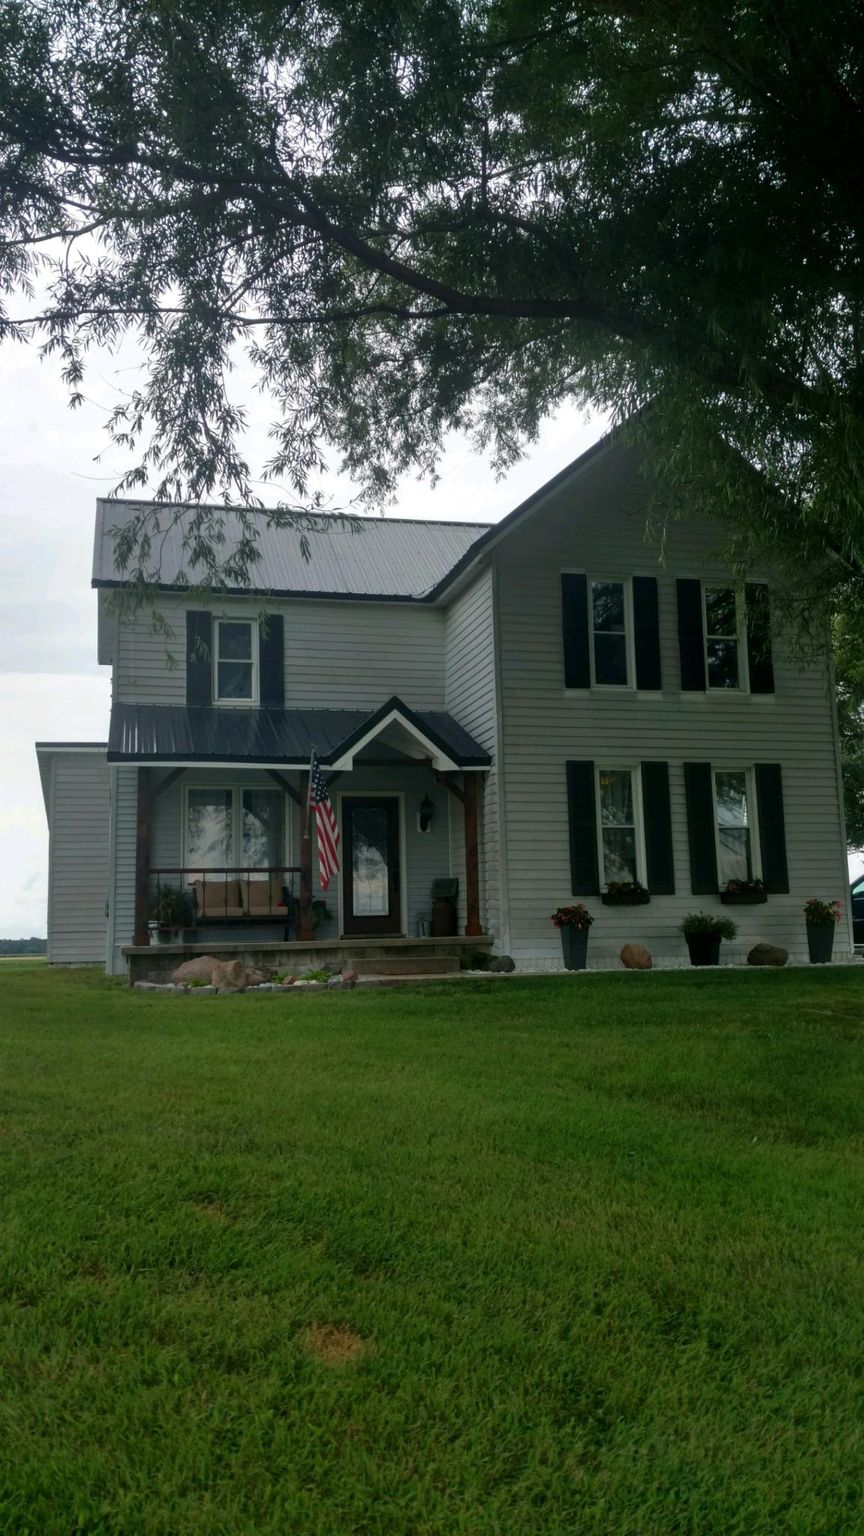 Ohio henry county ridgeville corners - 8070 County Road O3